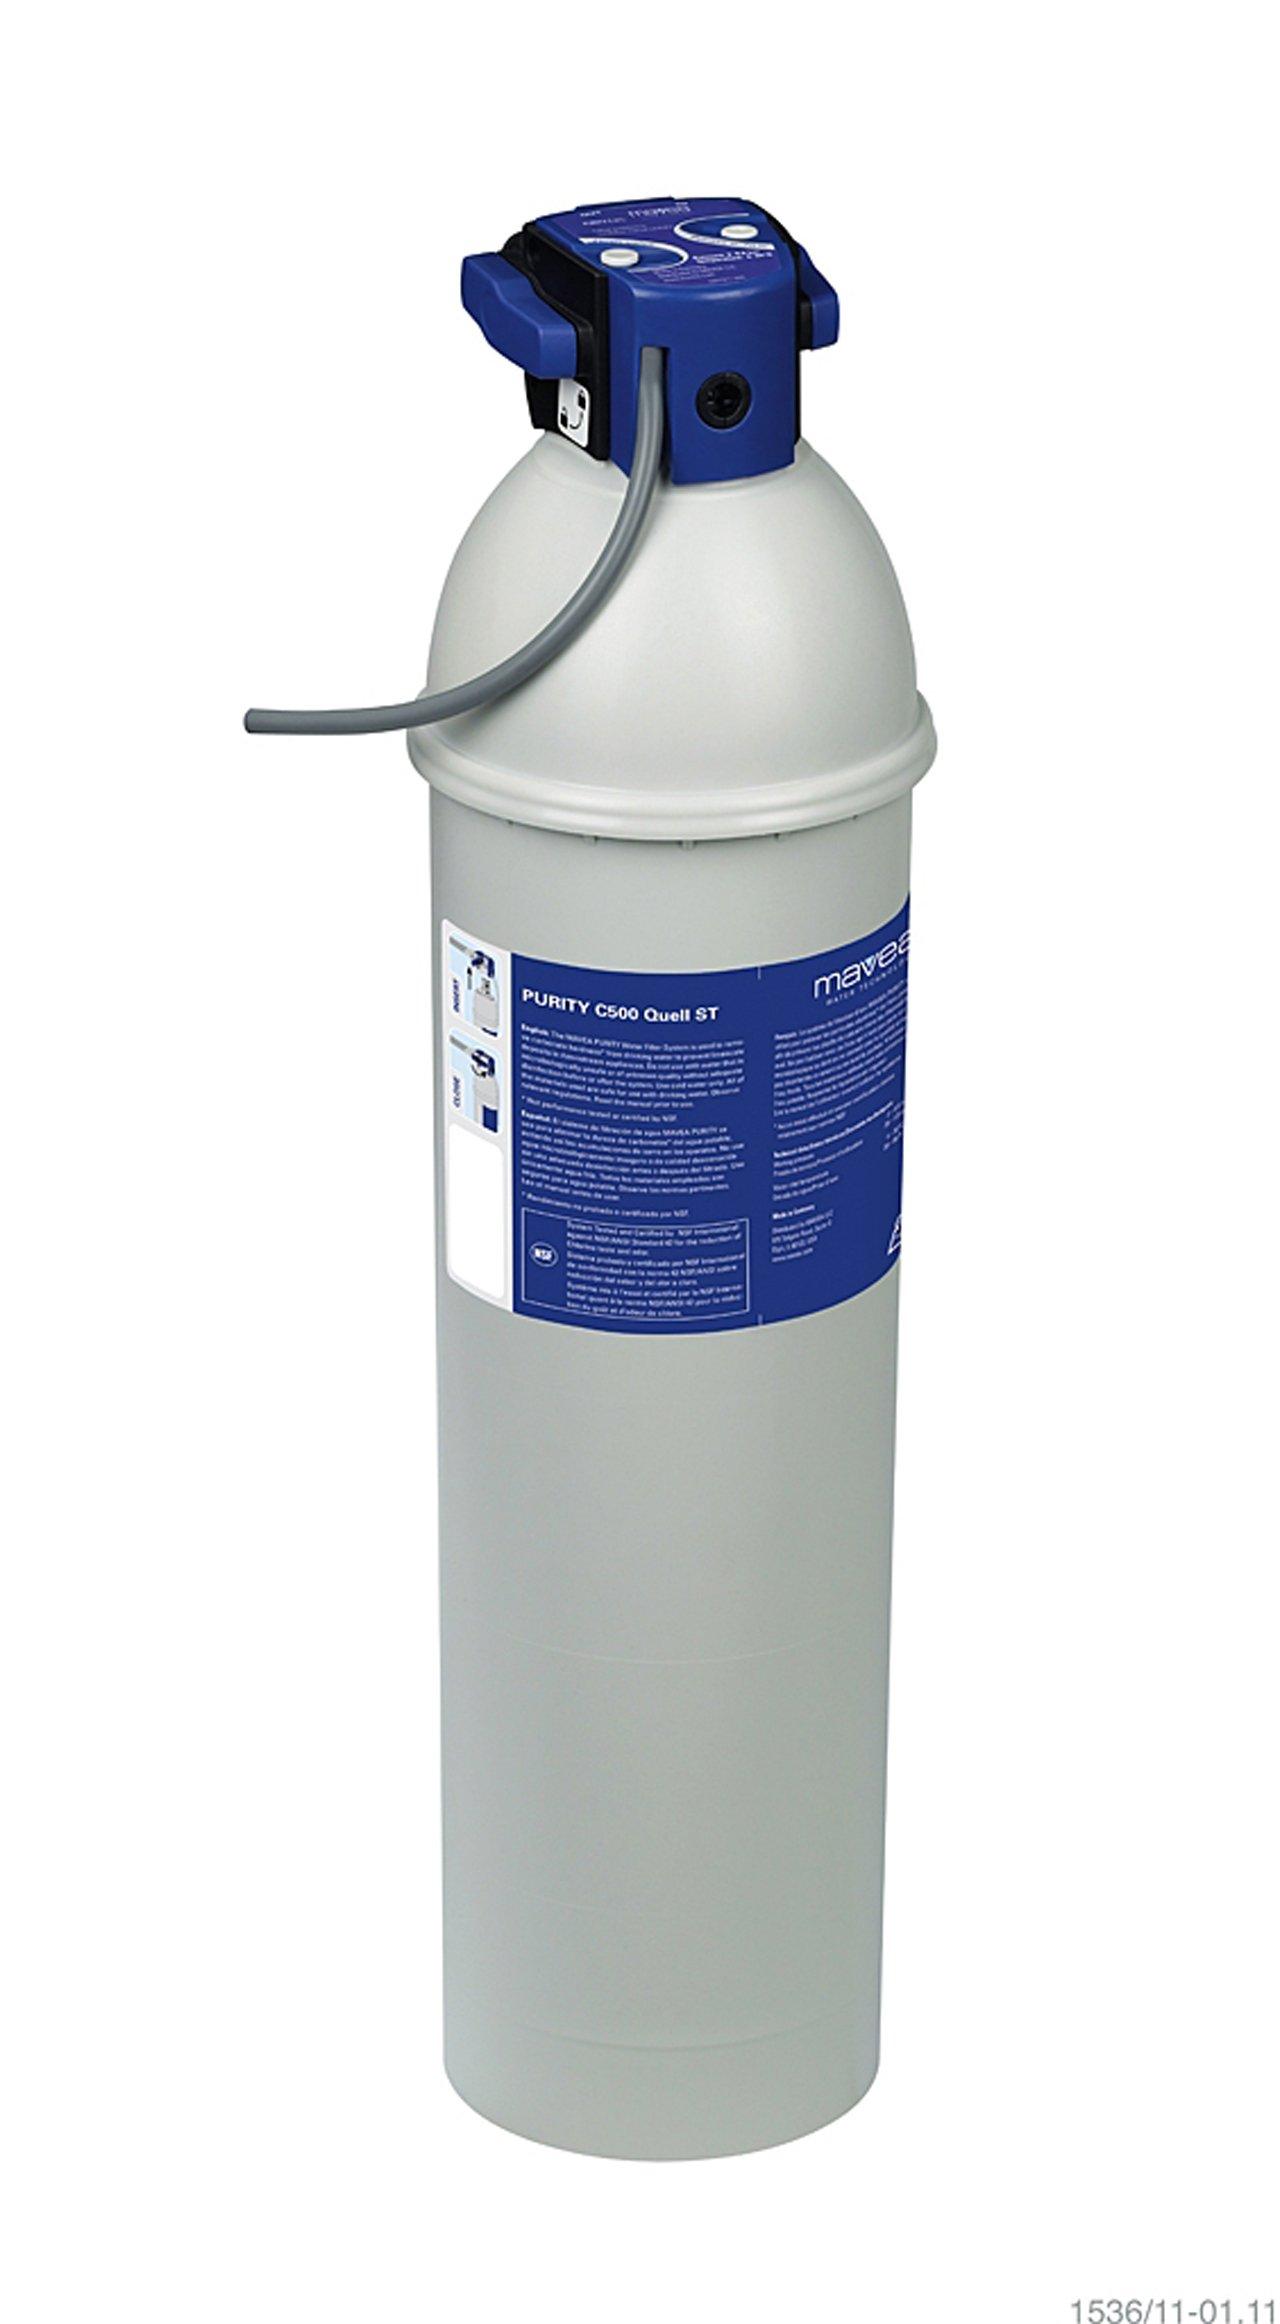 Grindmaster-Cecilware 250-00011 Purity C500 Water Filter Starter Kit